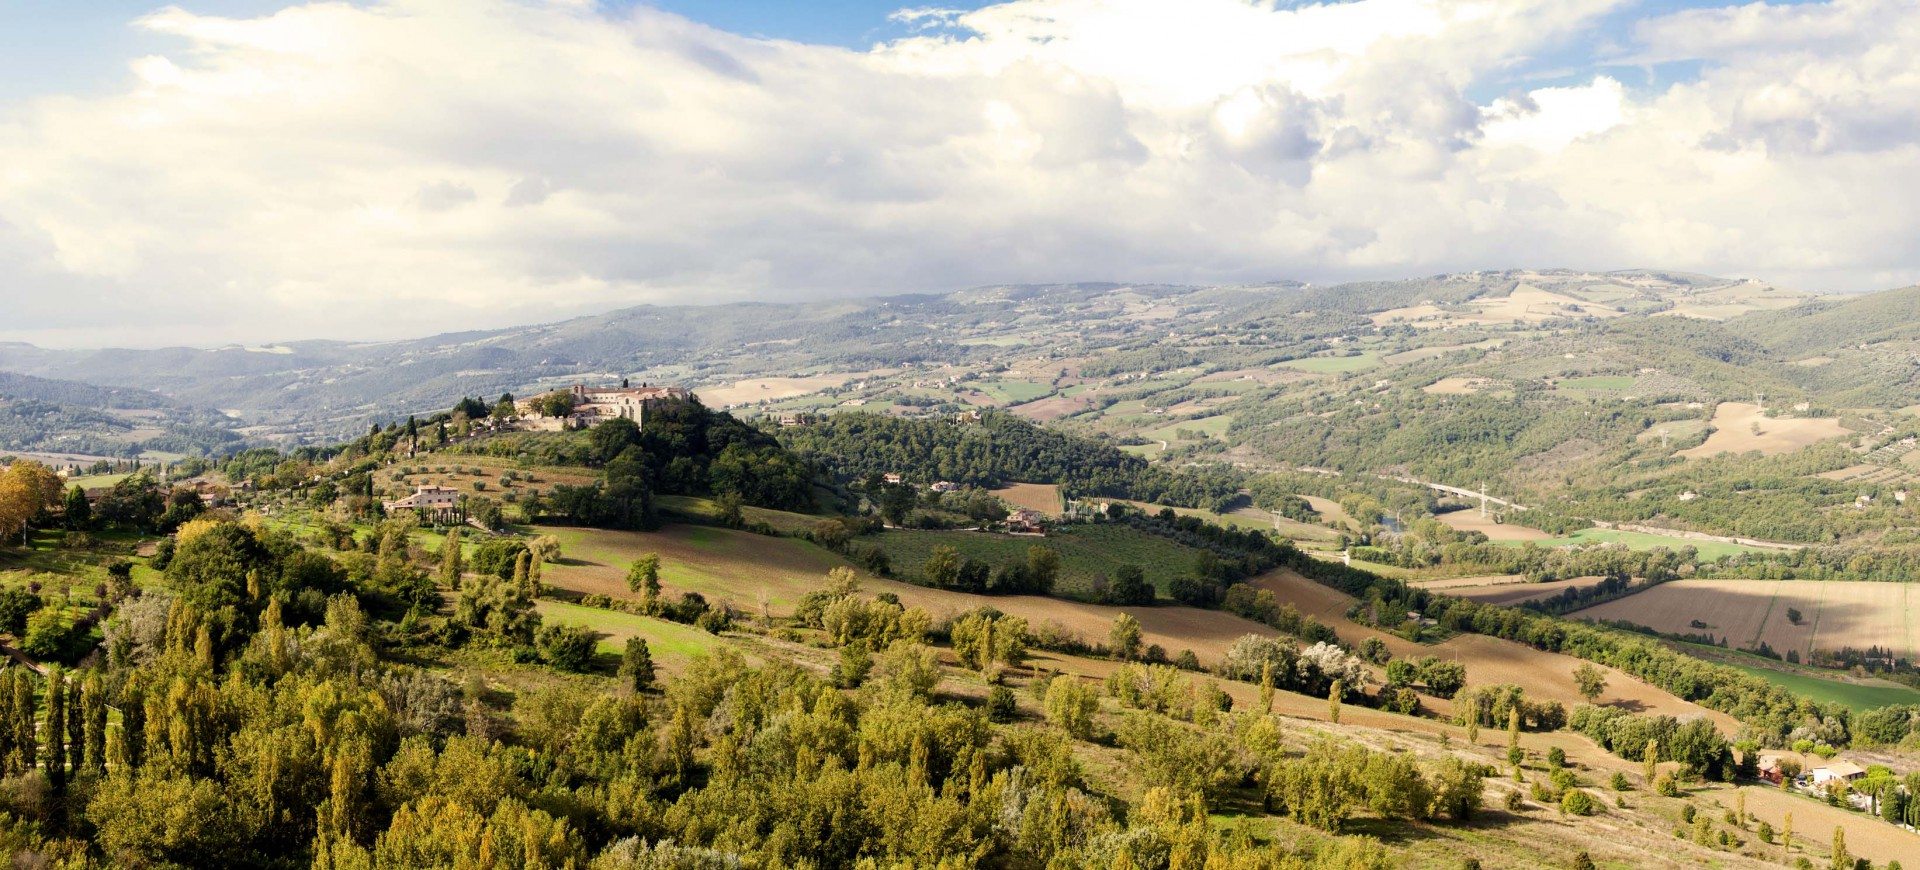 Hotel Fonte Cesia - Montesanto